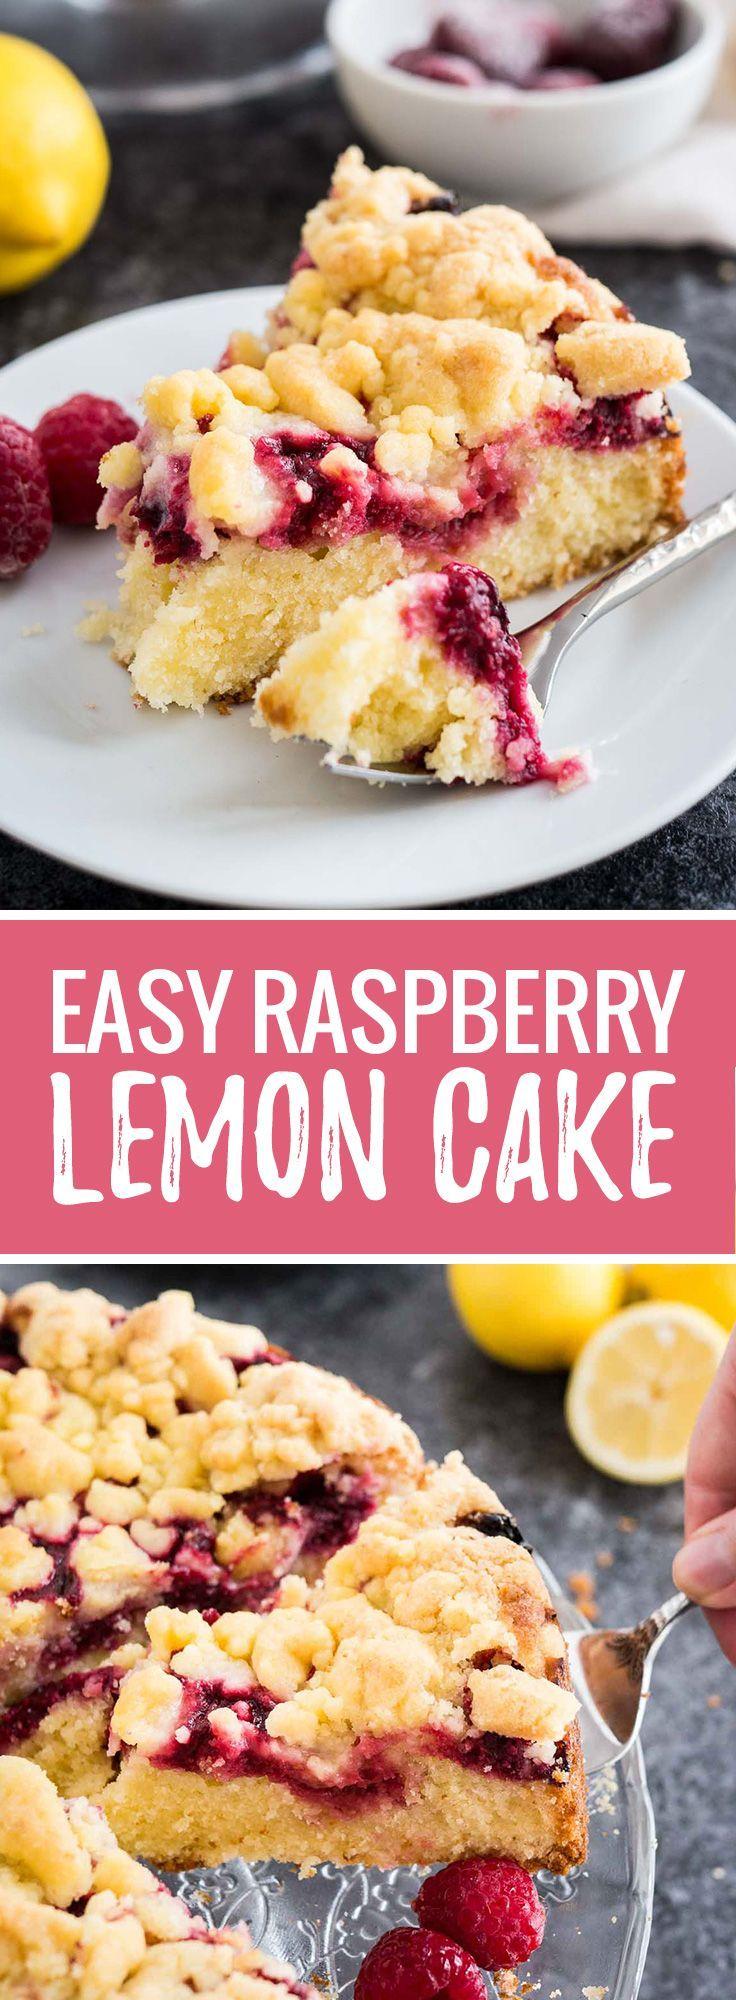 easy lemon raspberry cake with crumb topping recipe